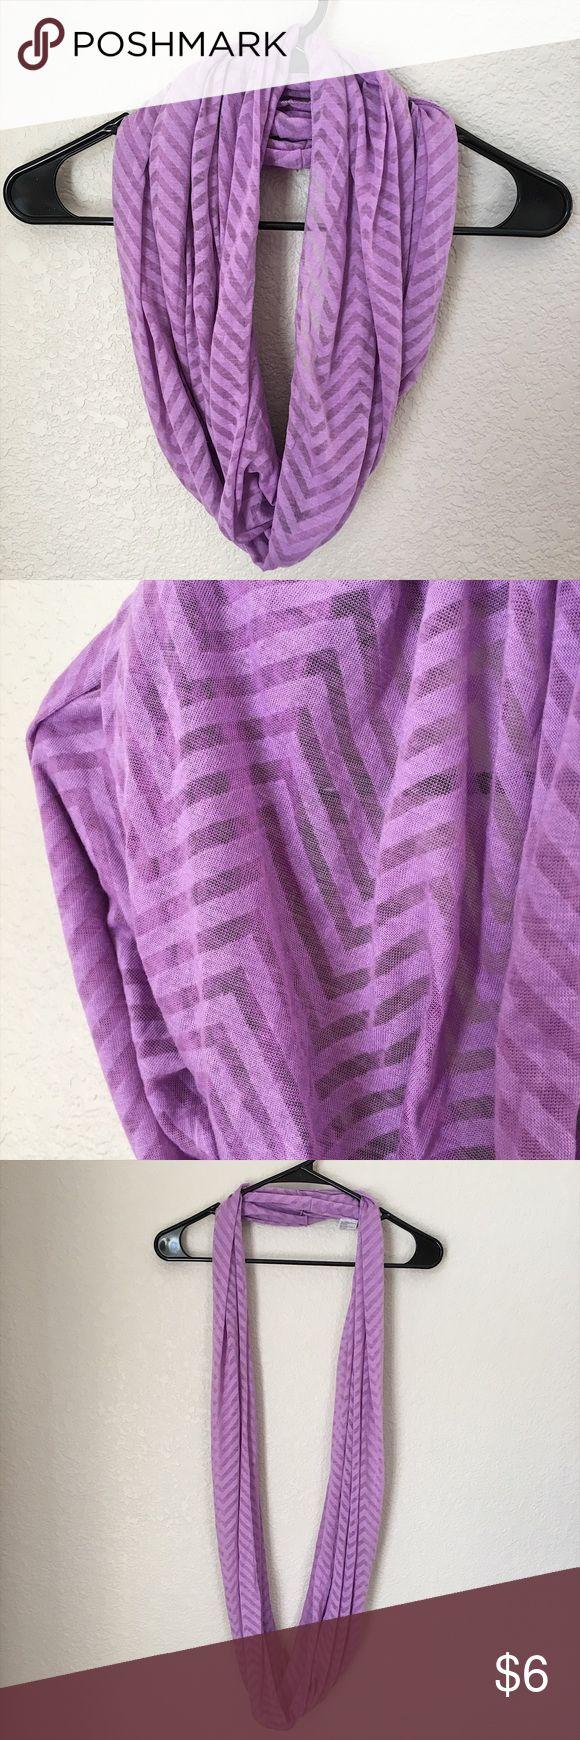 Chevron Infinitely Scarf Adorable light purple infinity scarf with a chevron pattern. Light weight. Accessories Scarves & Wraps